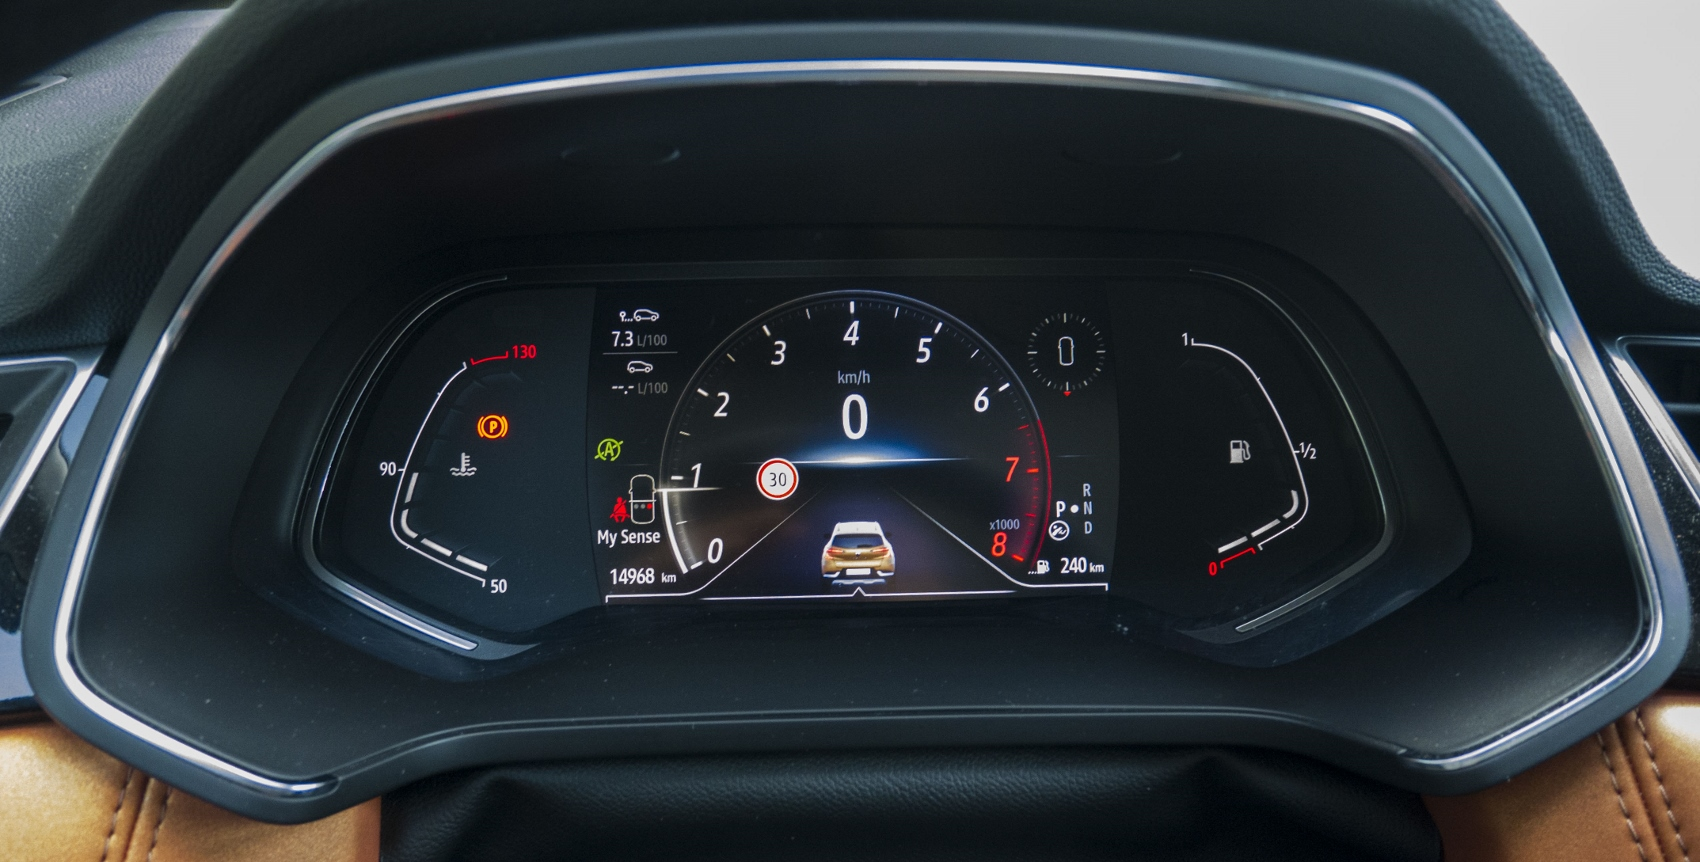 Test: V interiéri sa Renault Captur tvári ako o triedu drahšie auto Qh2ILMnBZt renault-captur-19